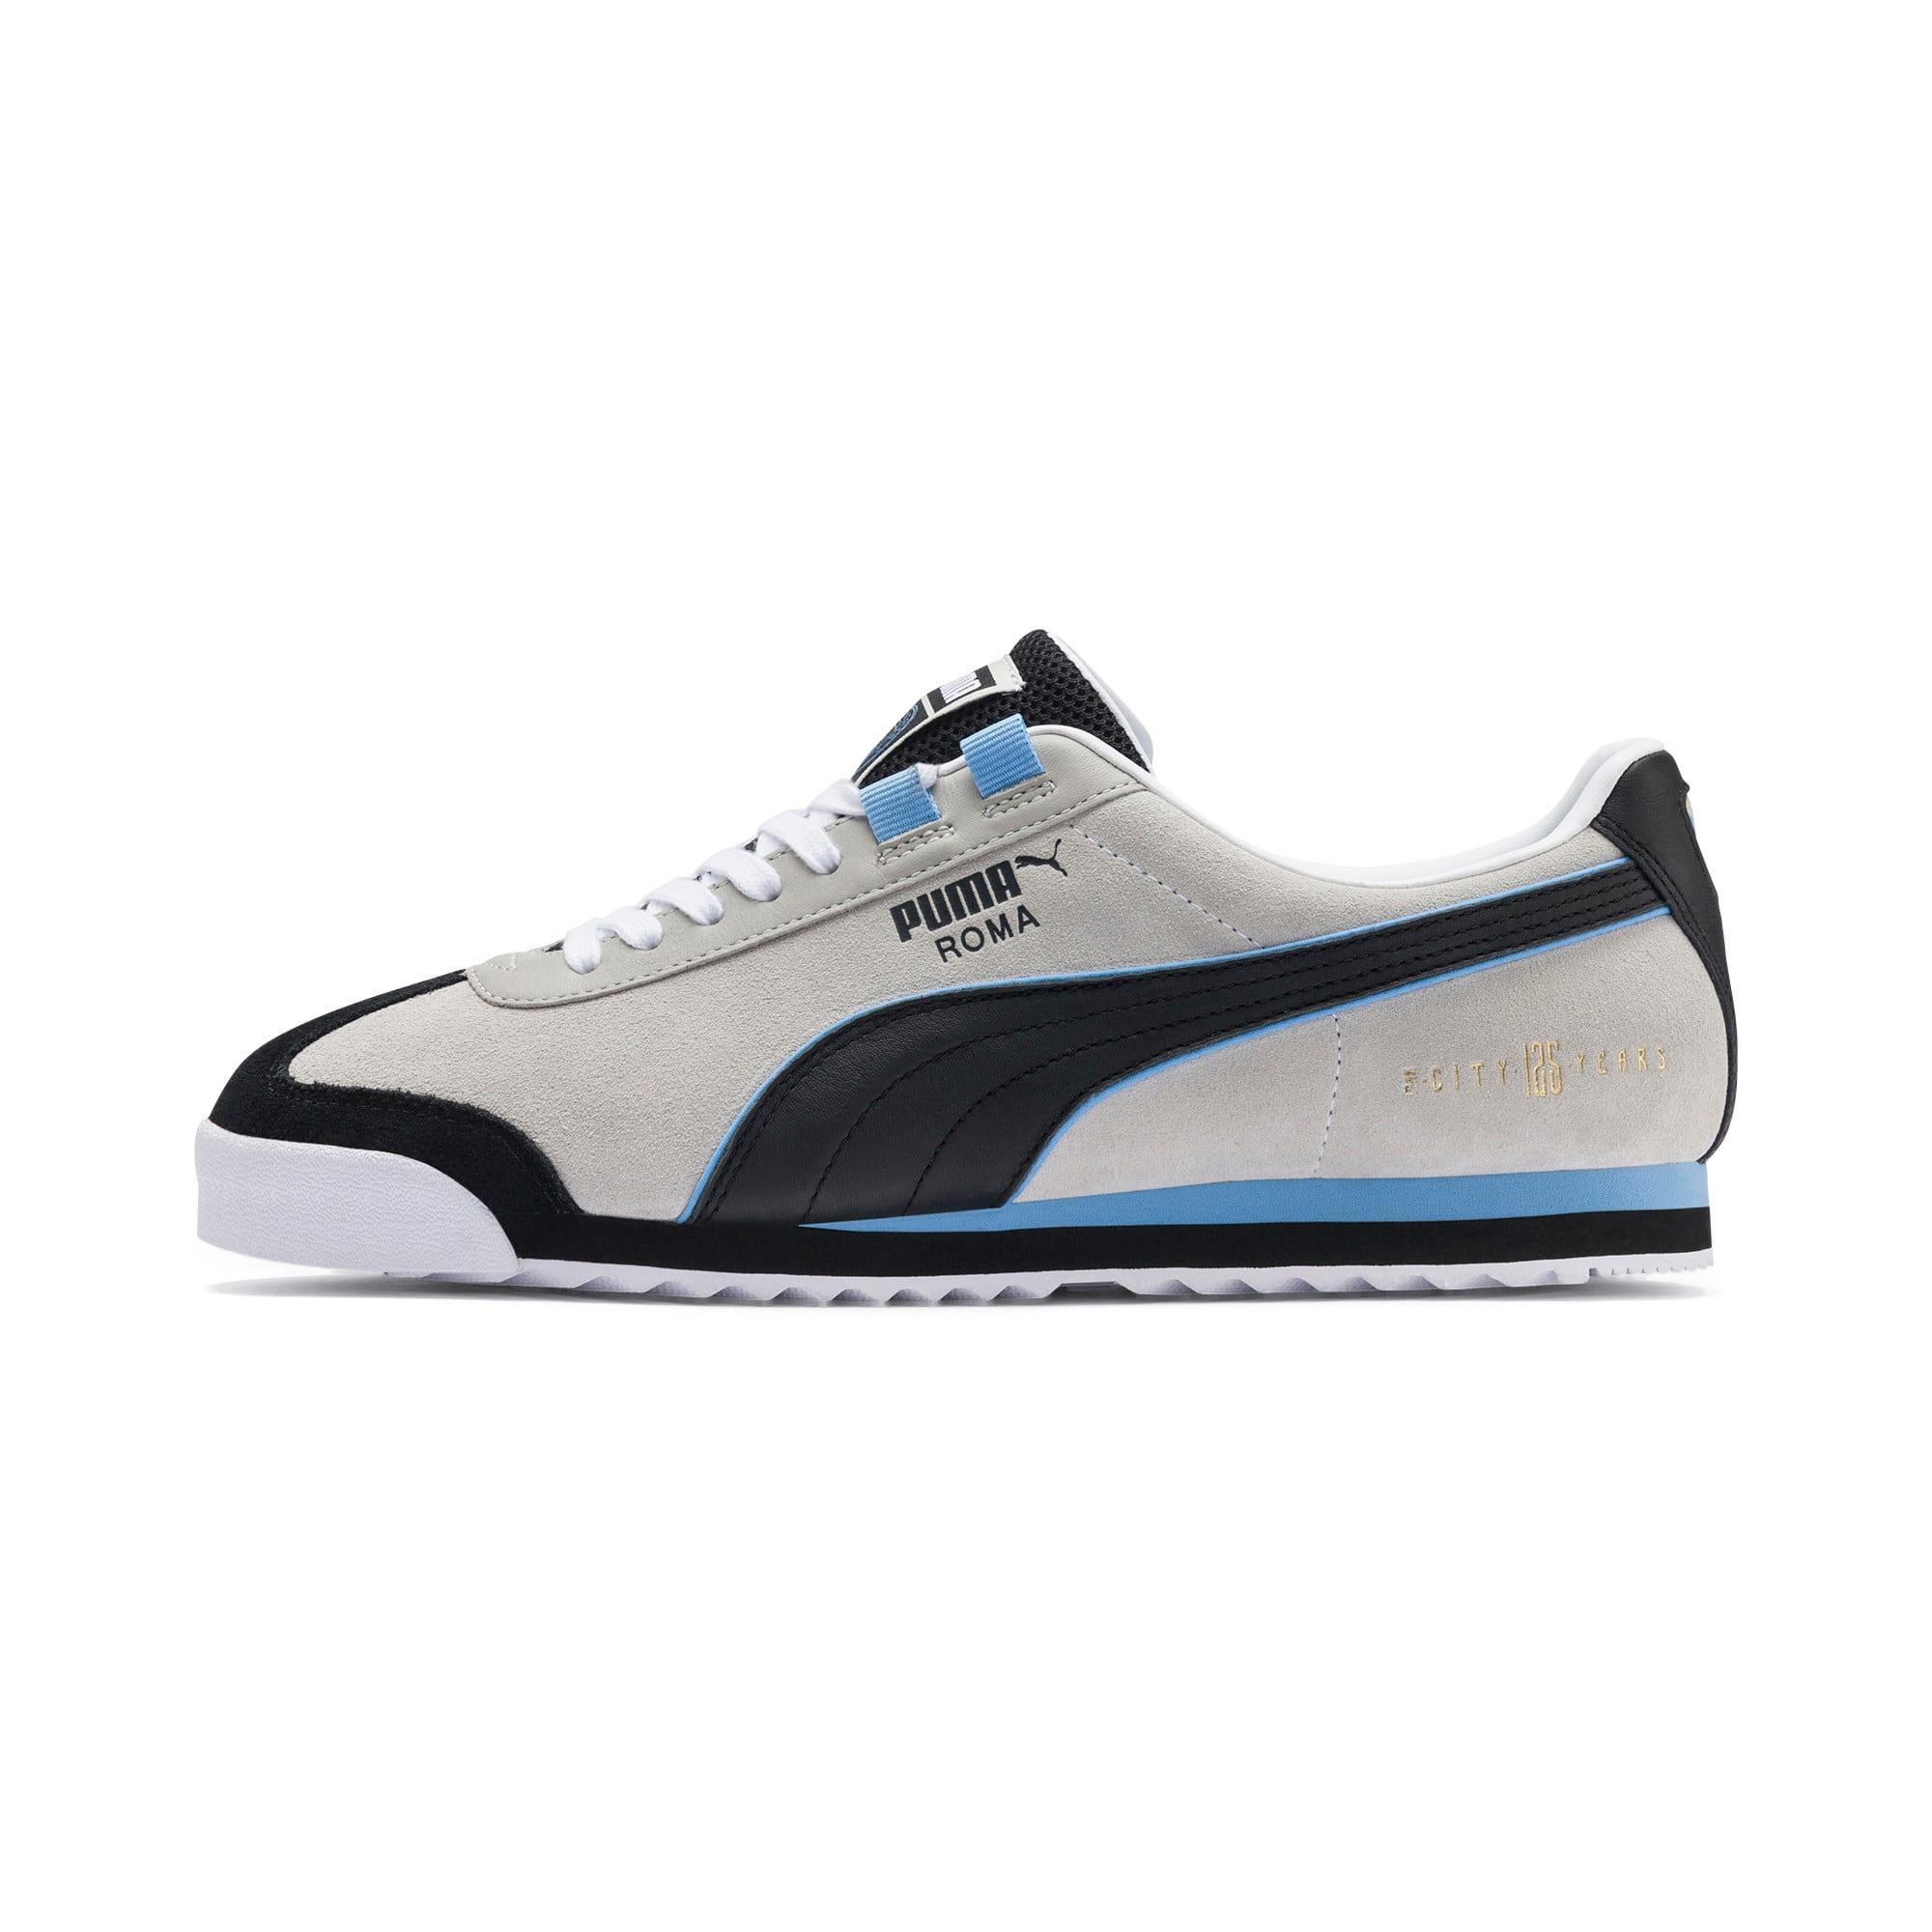 Thumbnail 1 of Roma Manchester City Men's Sneakers, Gray Violet-Team Light Blue, medium